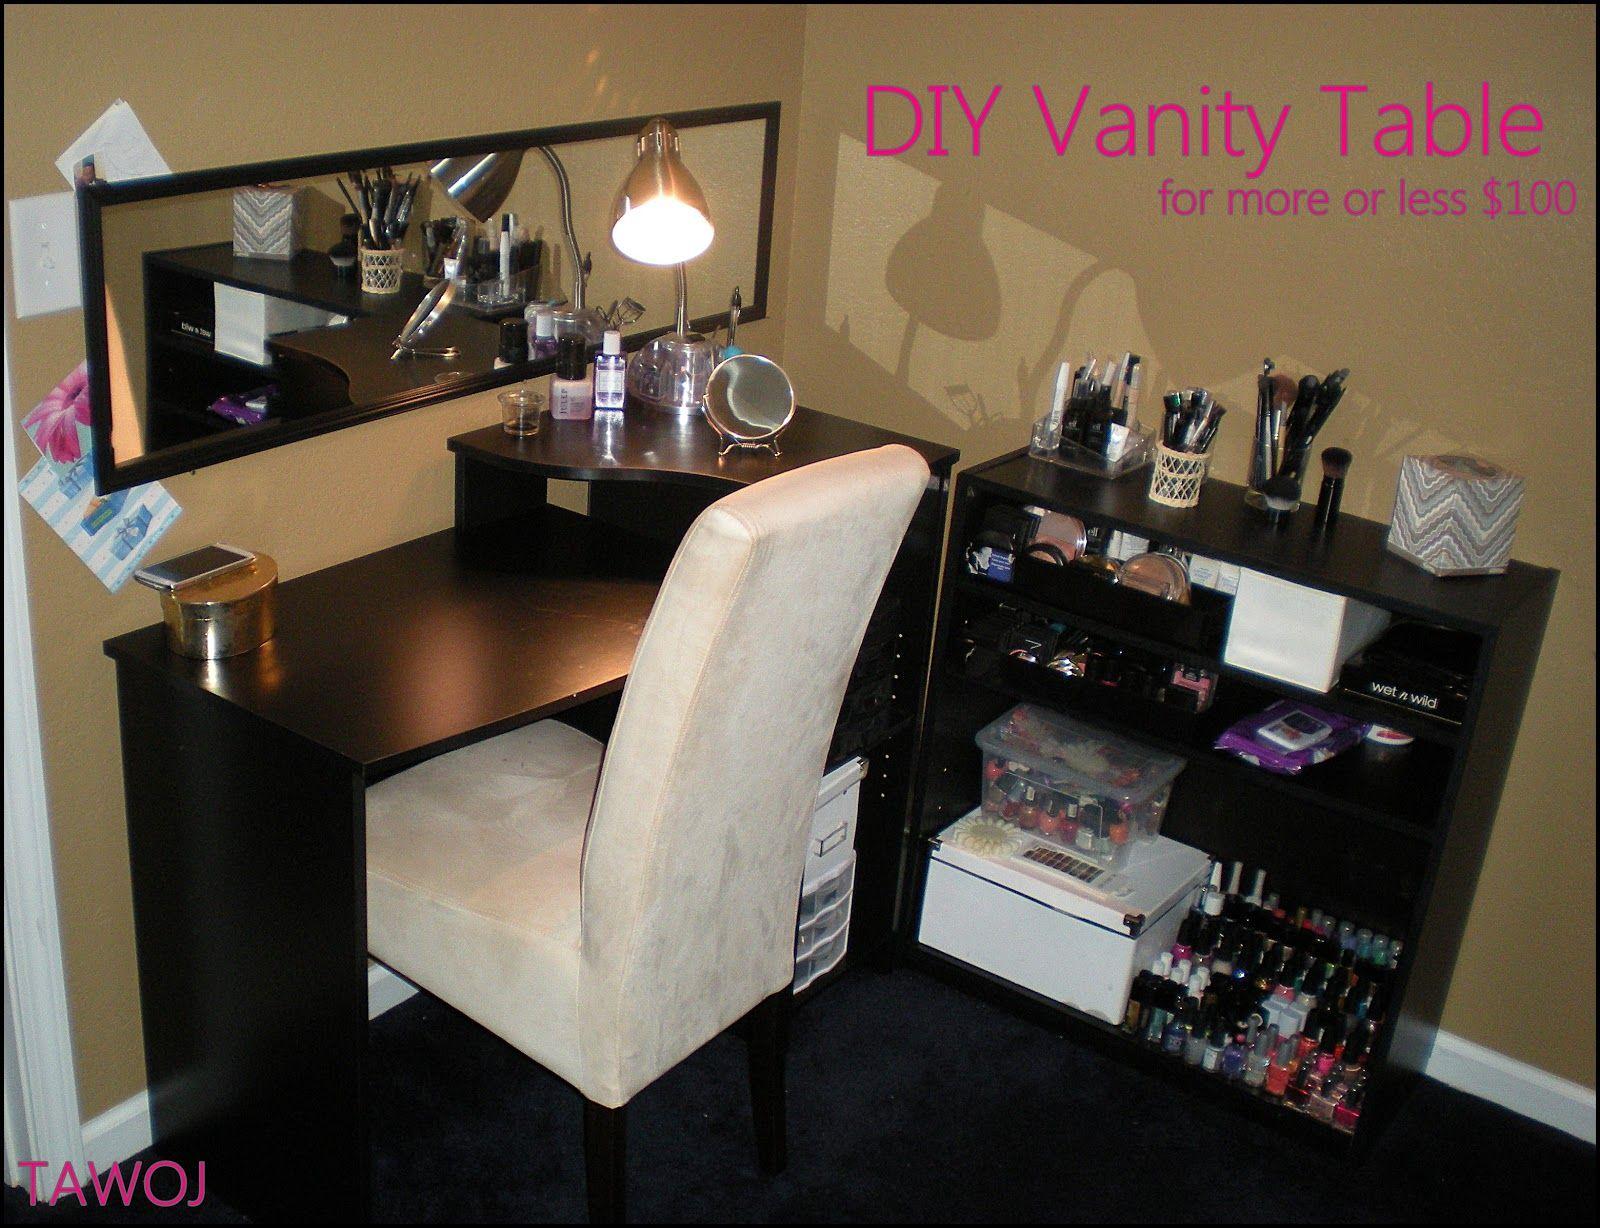 Charming Glitz Glam Budget   A Budget Friendly Beauty Blog: Guest Post: Affordable  Vanity Setup